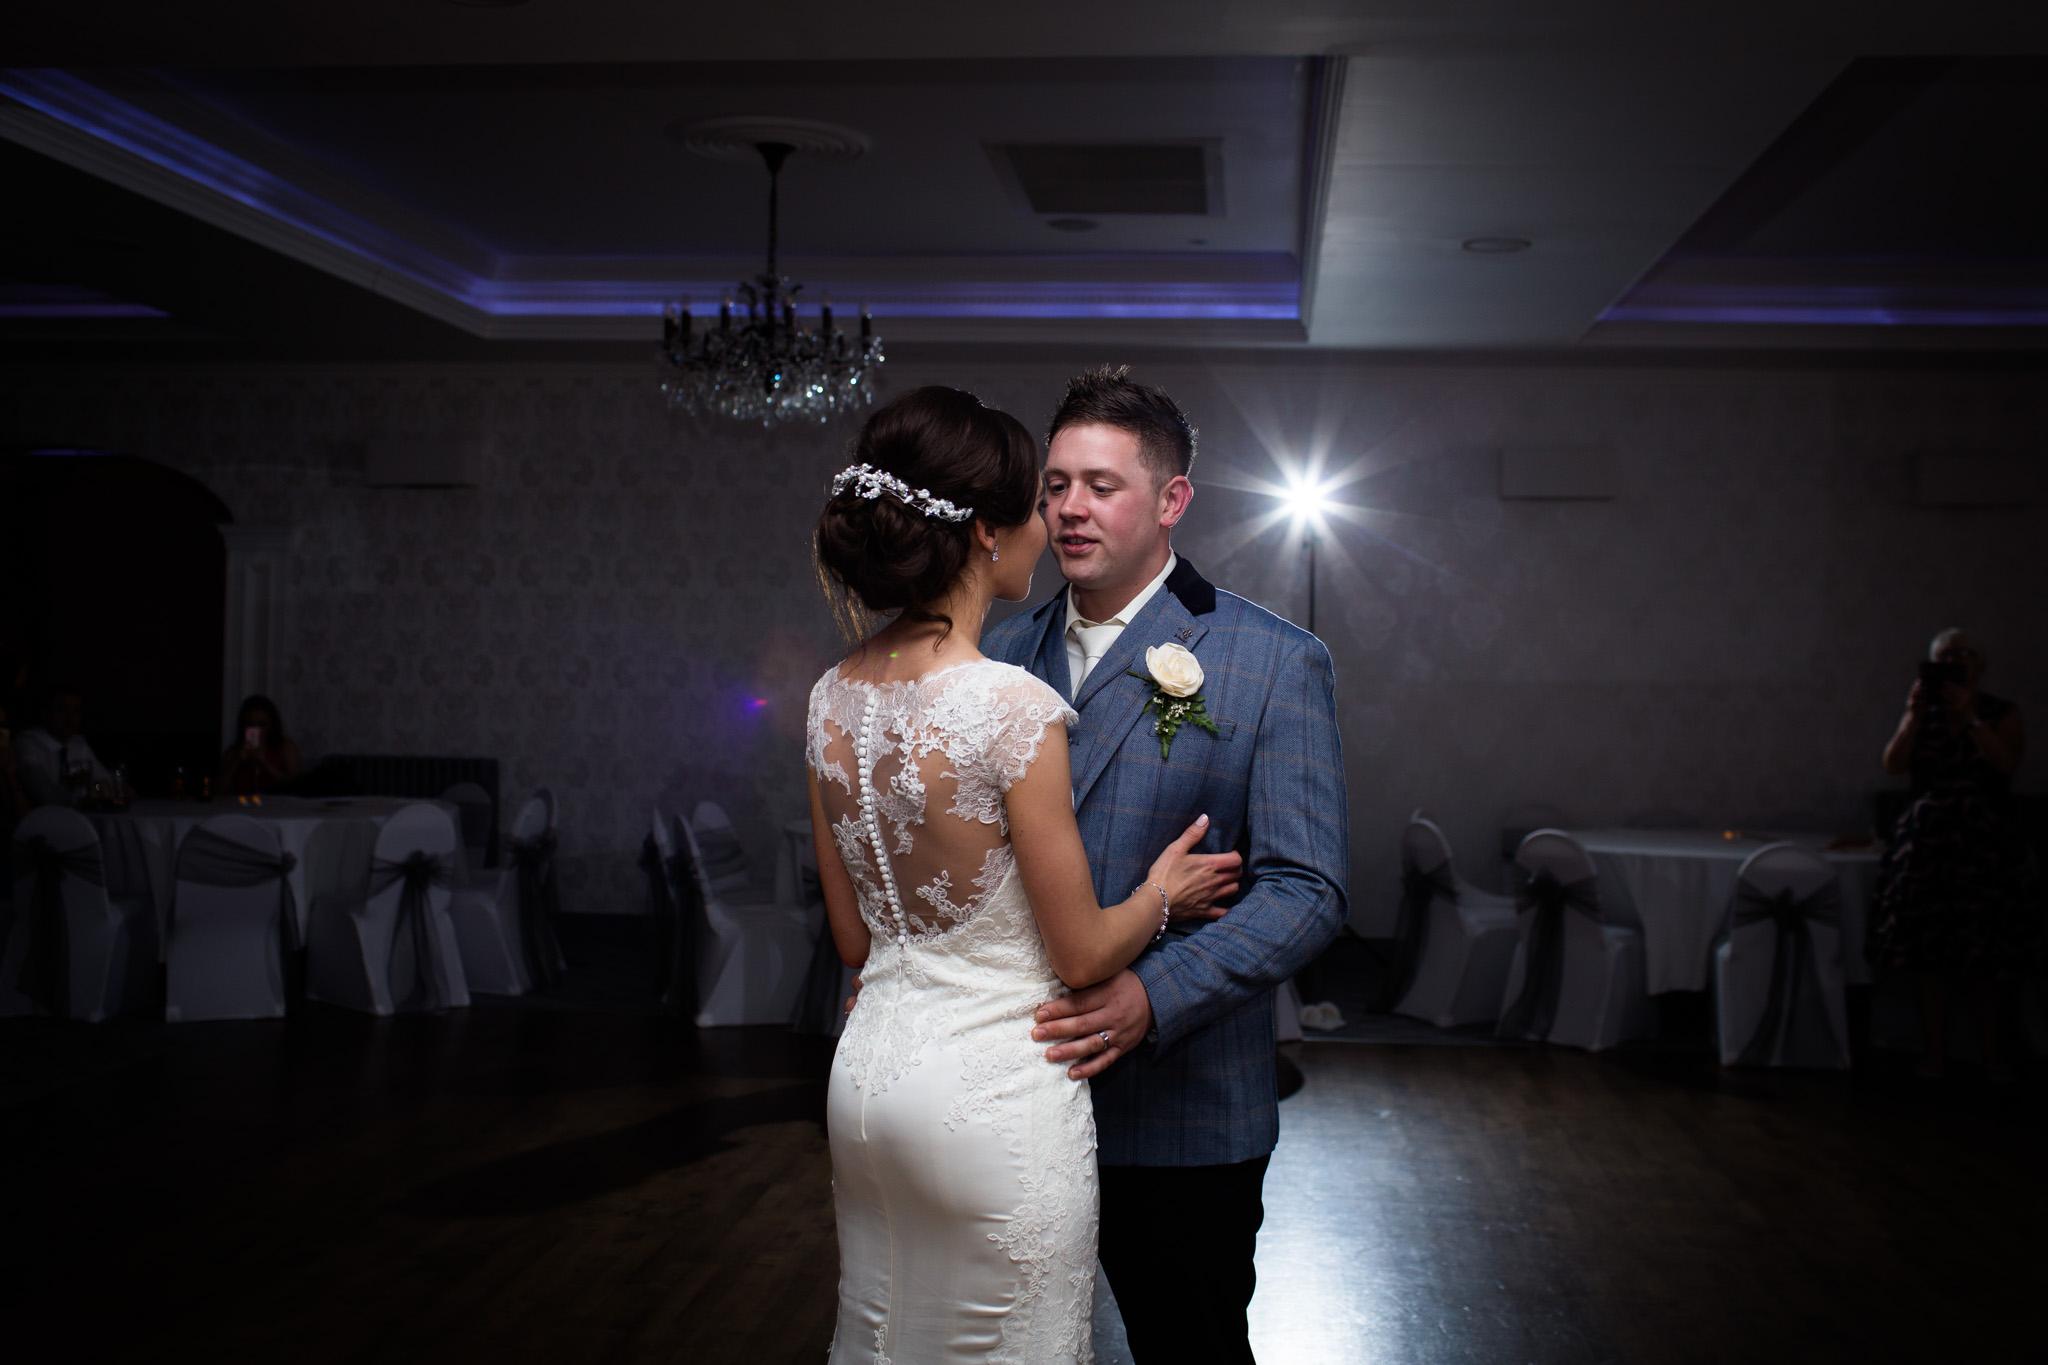 Mark_Barnes_Northern_Ireland_Wedding_Photography_Leighinmohr-house-hotel-ballymena_Wedding_Photography-64.jpg